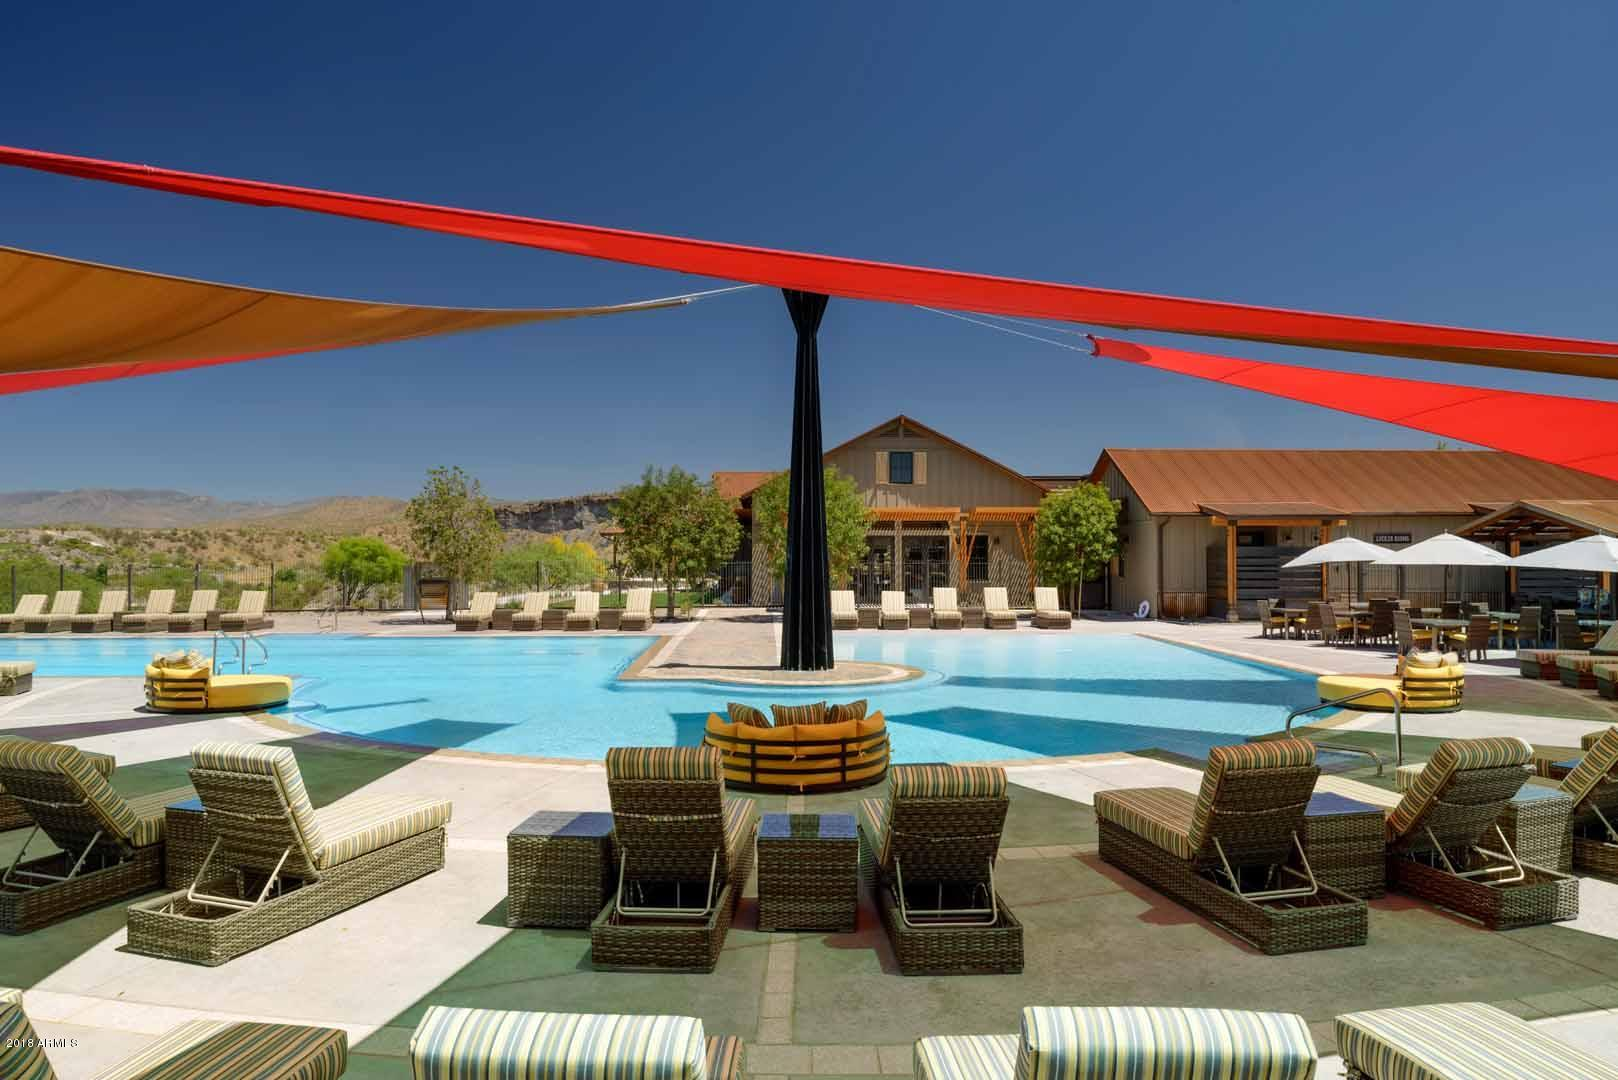 MLS 5834446 3685 STAMPEDE Drive, Wickenburg, AZ 85390 Wickenburg AZ Two Bedroom